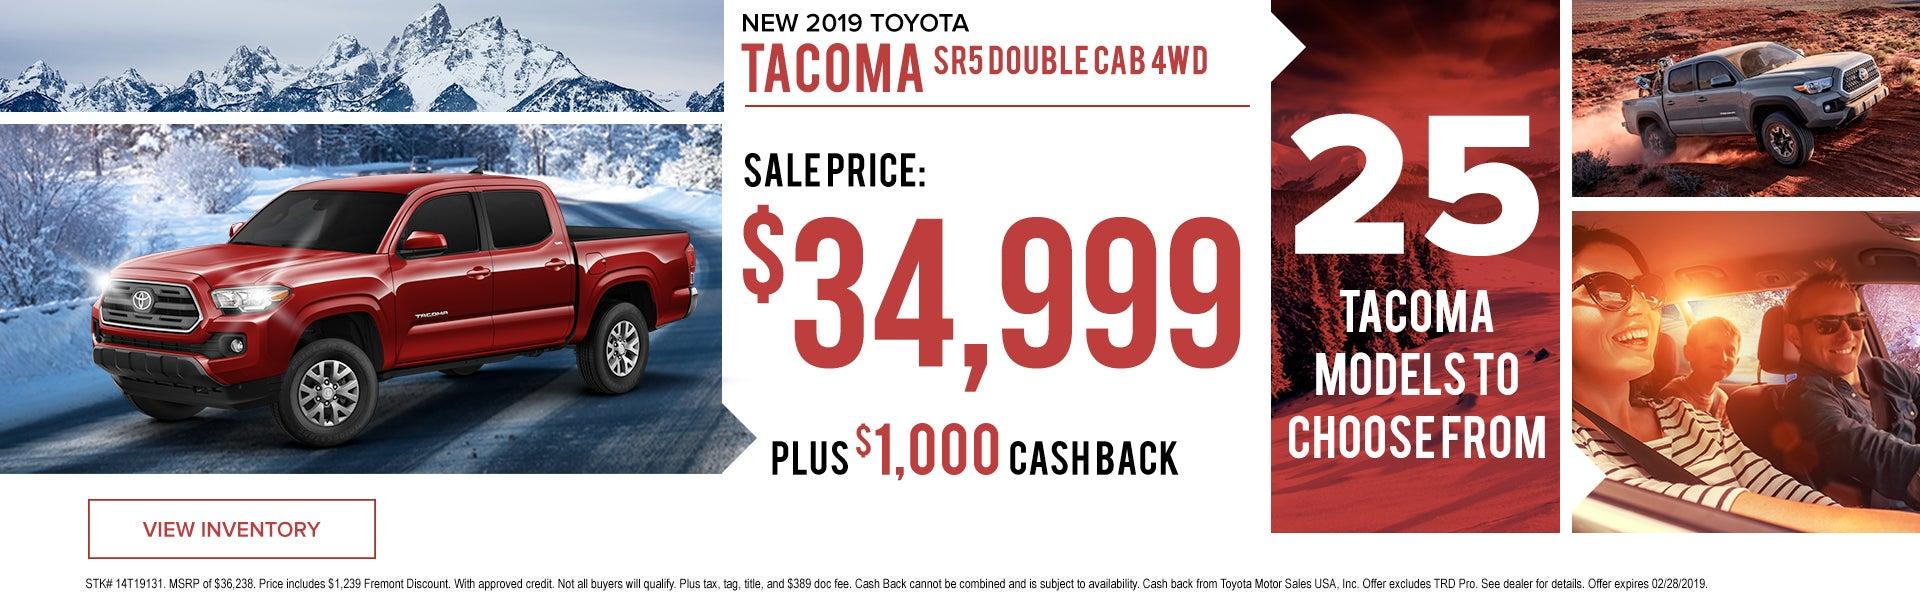 New 2019 Toyota Tacoma Fremont Toyota Sheridan Specials Sheridan Wy